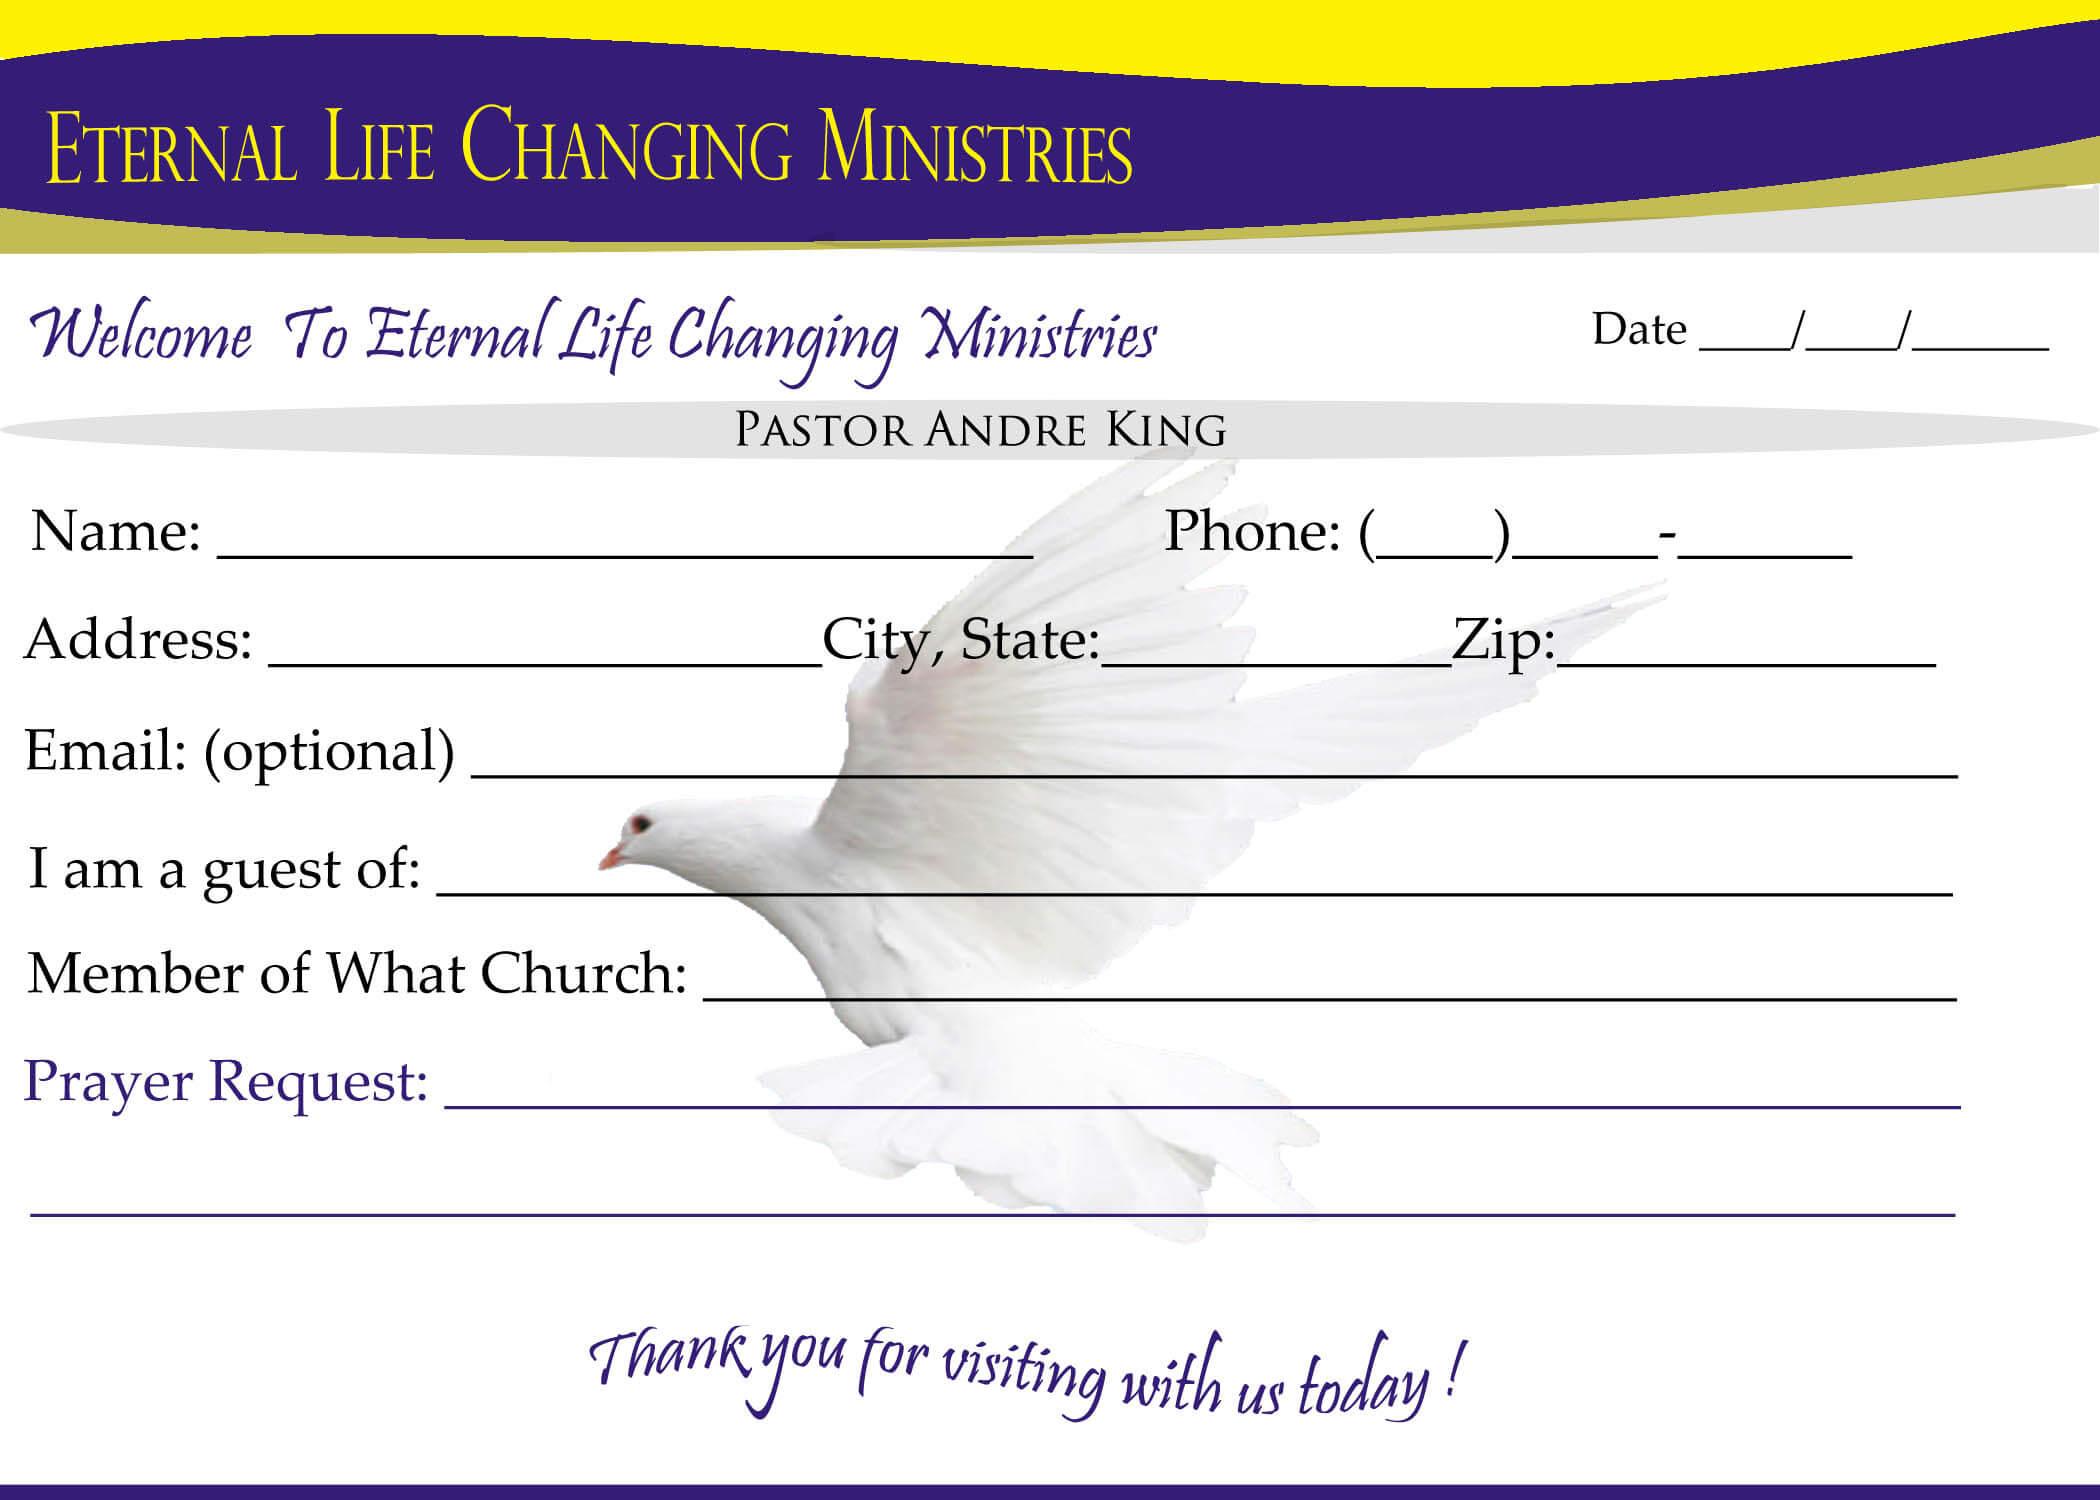 007 Template Ideas Eternal Life Visitor Card Church Regarding Church Visitor Card Template Word